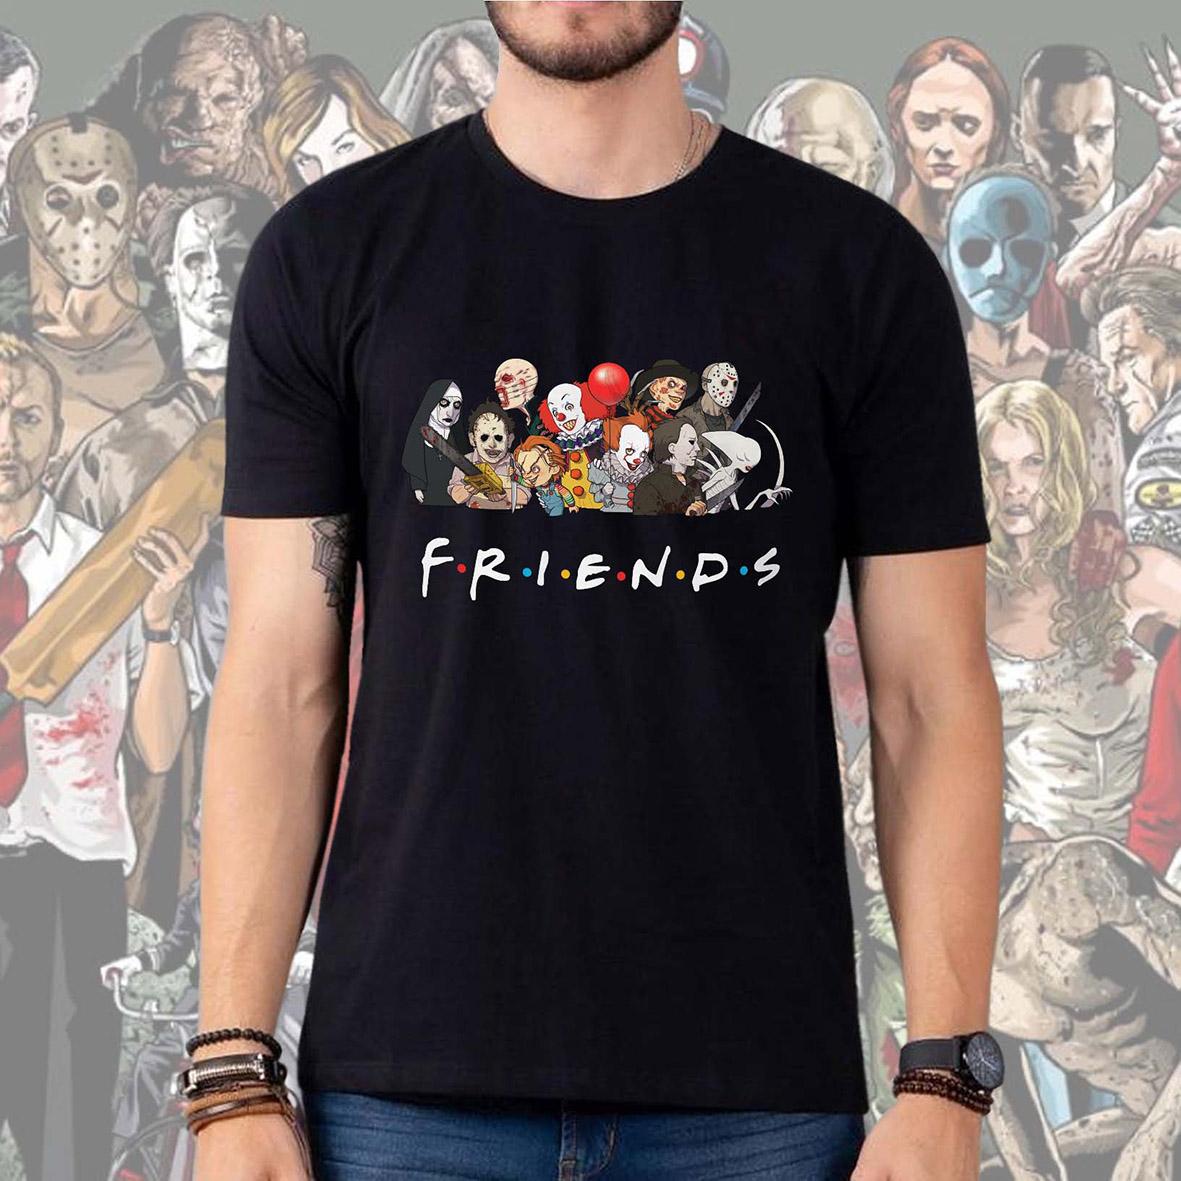 Camiseta Masculina Unissex Friends Halloween Horror Serial Killers Terror (Preta) - EV